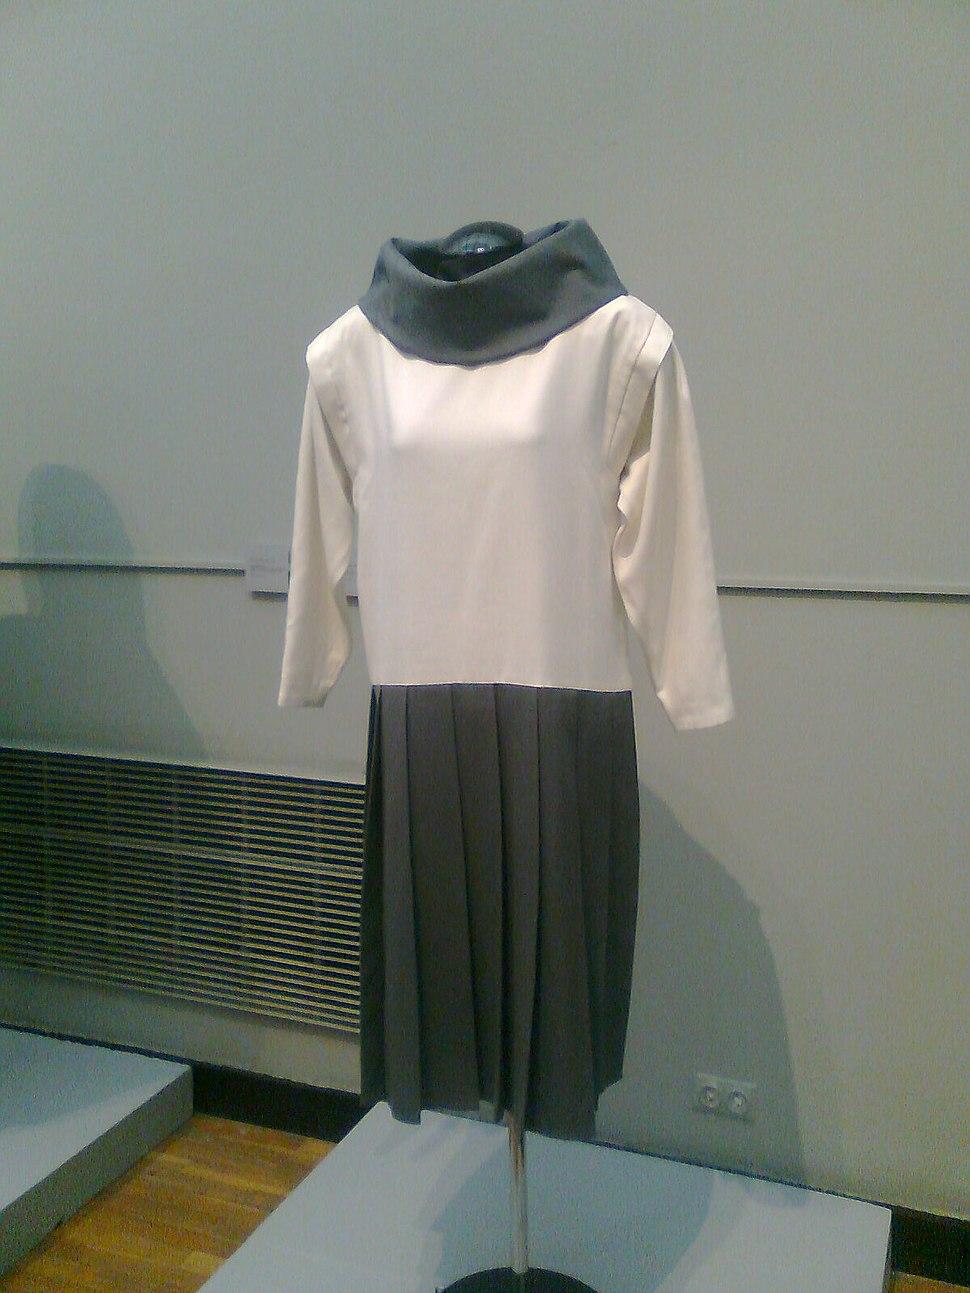 Vladimir Tatlin's dress design